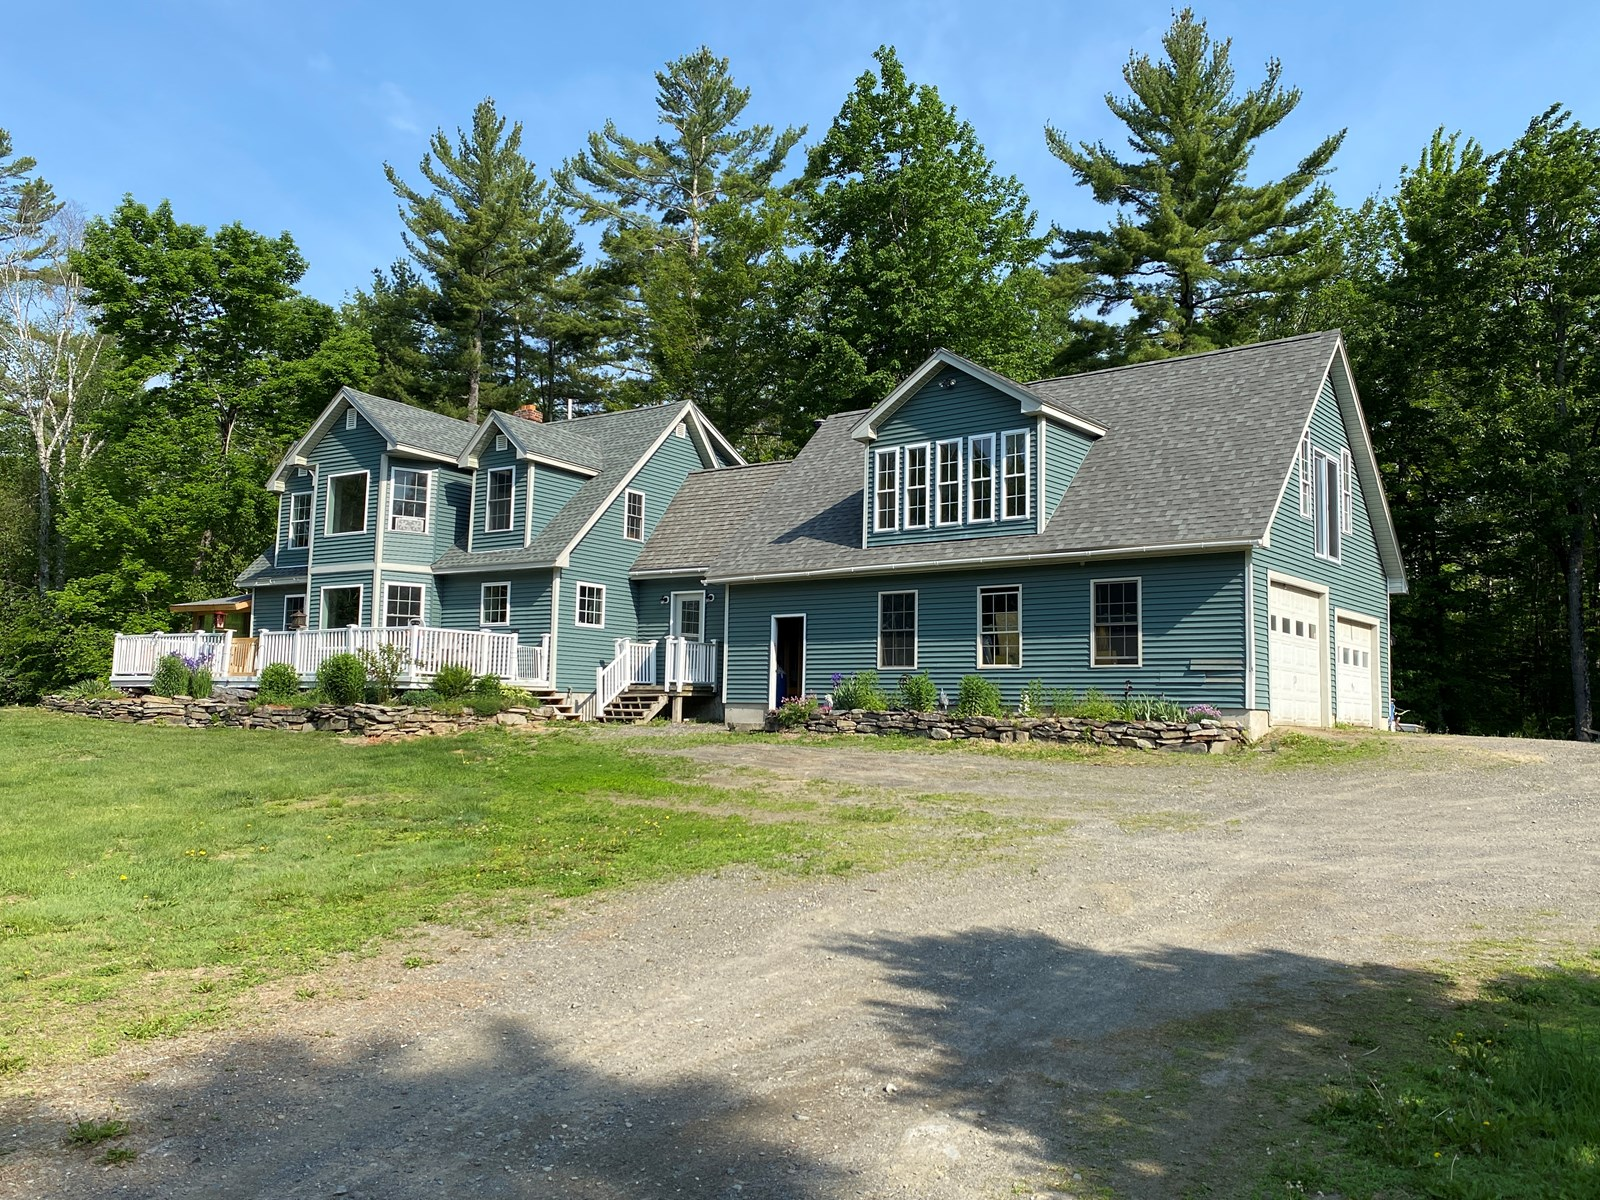 Contemporary Colonial in Piscataquis, Maine